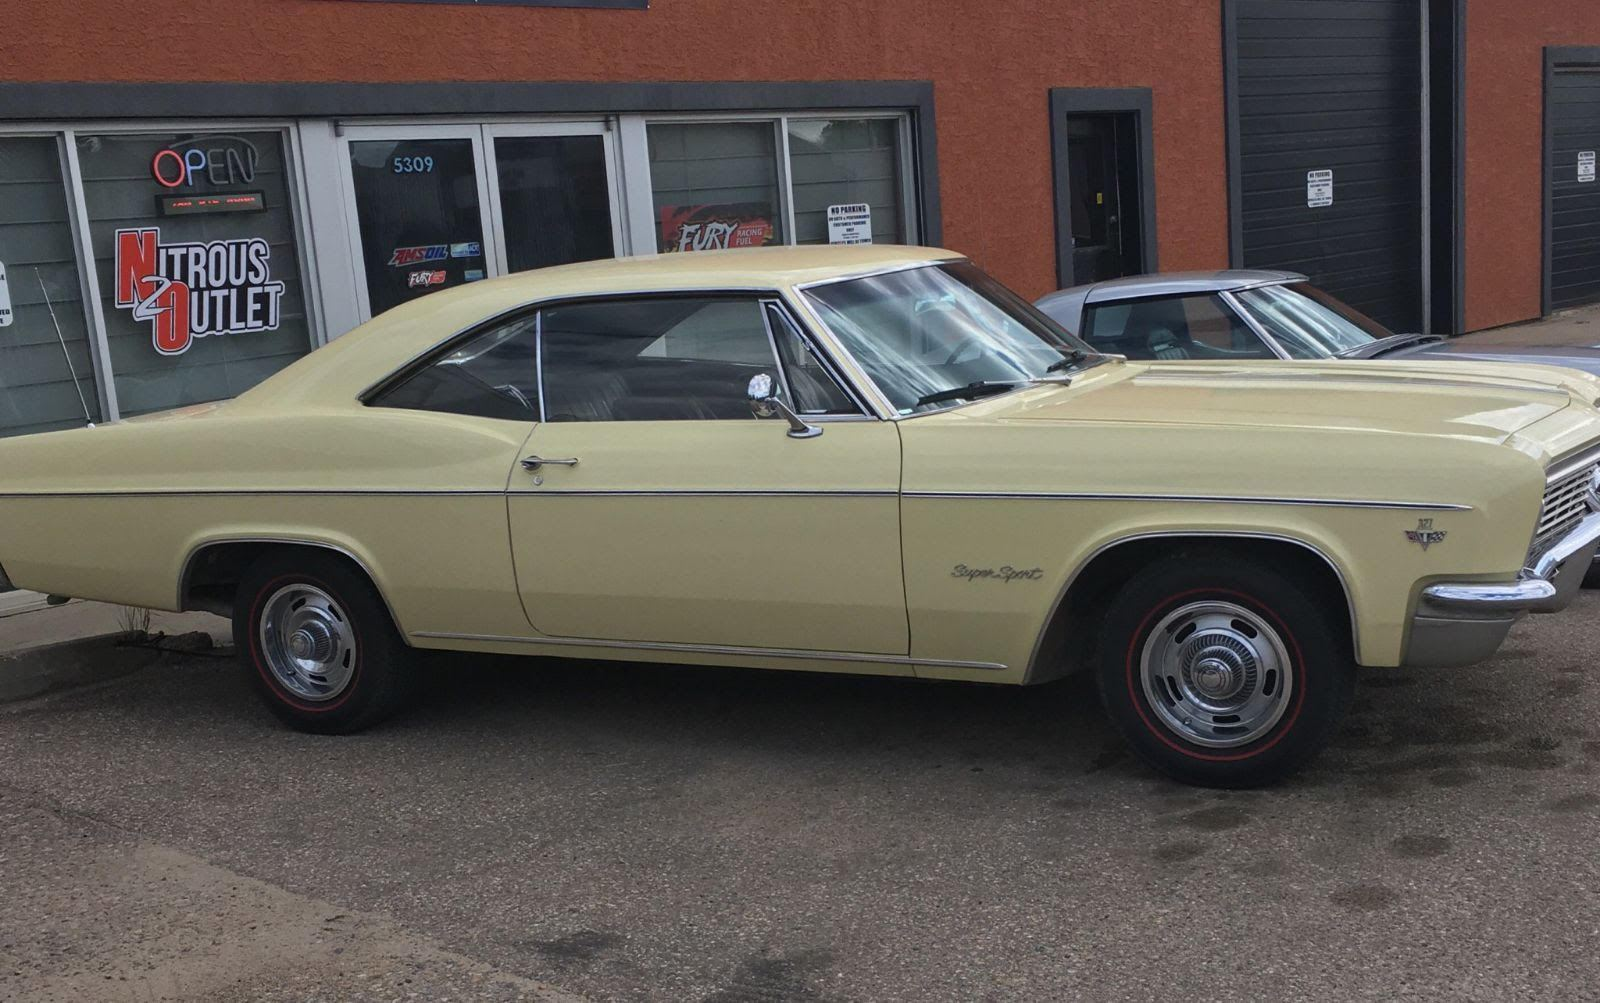 1966 Chevrolet Impala 327 4 speed